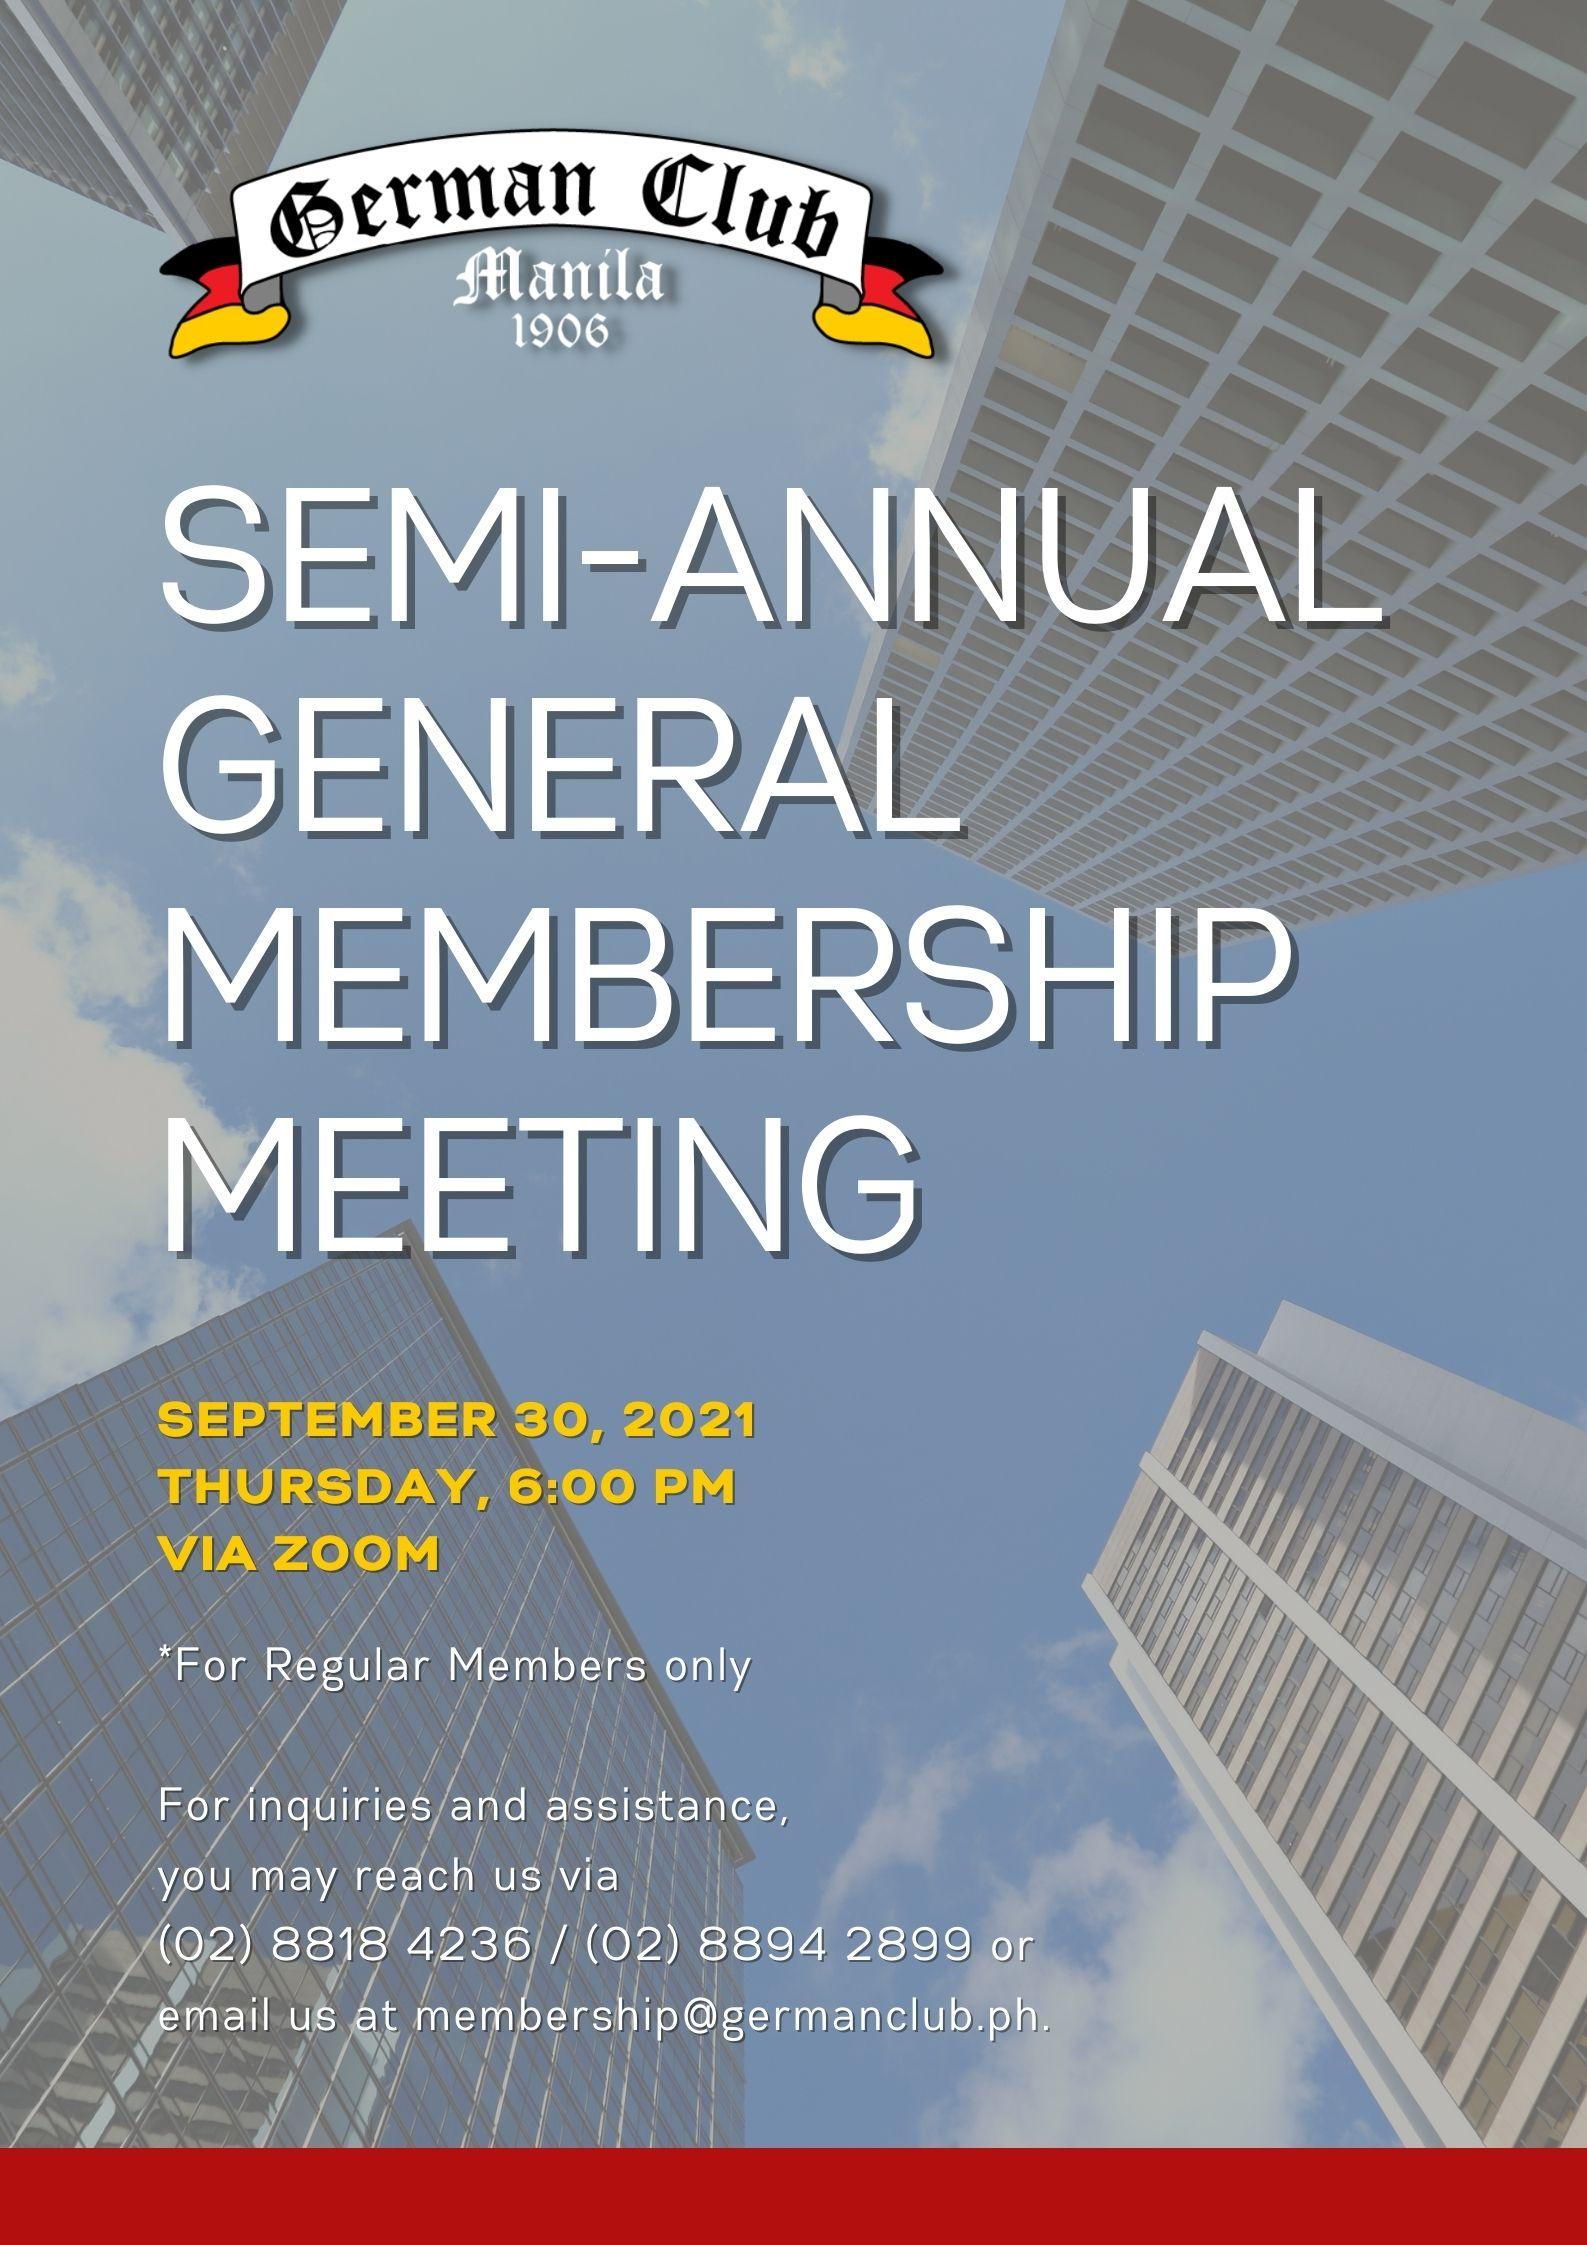 Semi-Annual General Membership Meeting (SAGM)